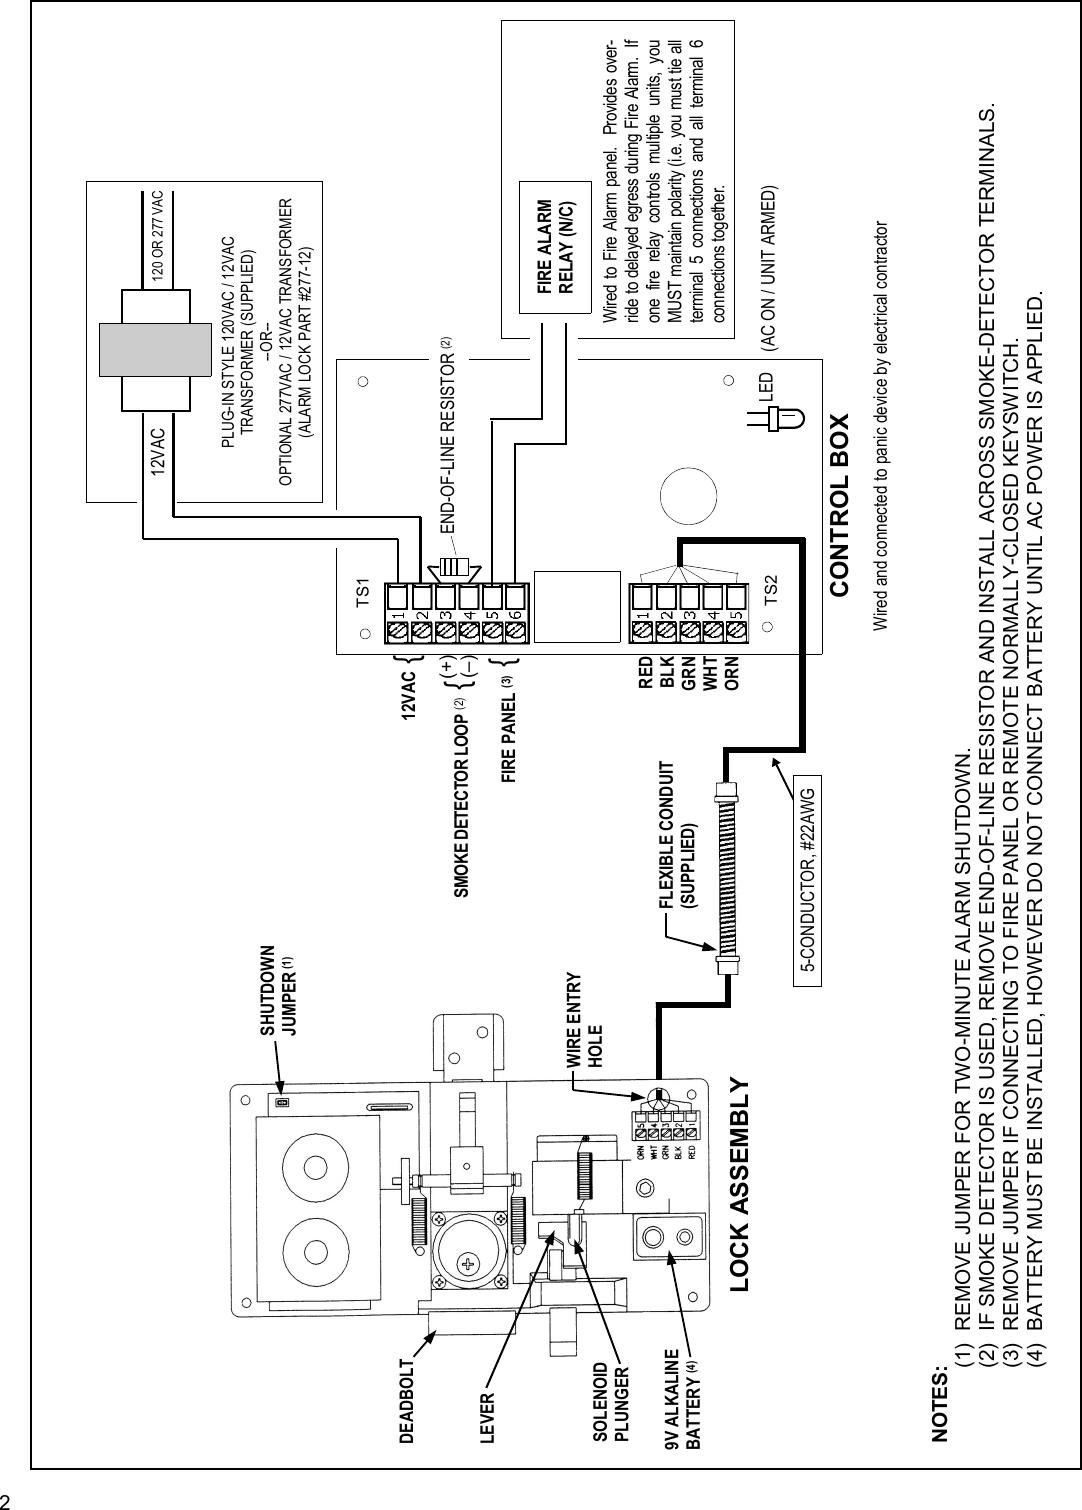 hight resolution of  alarm lock wiring diagram wiring diagram p on warlock